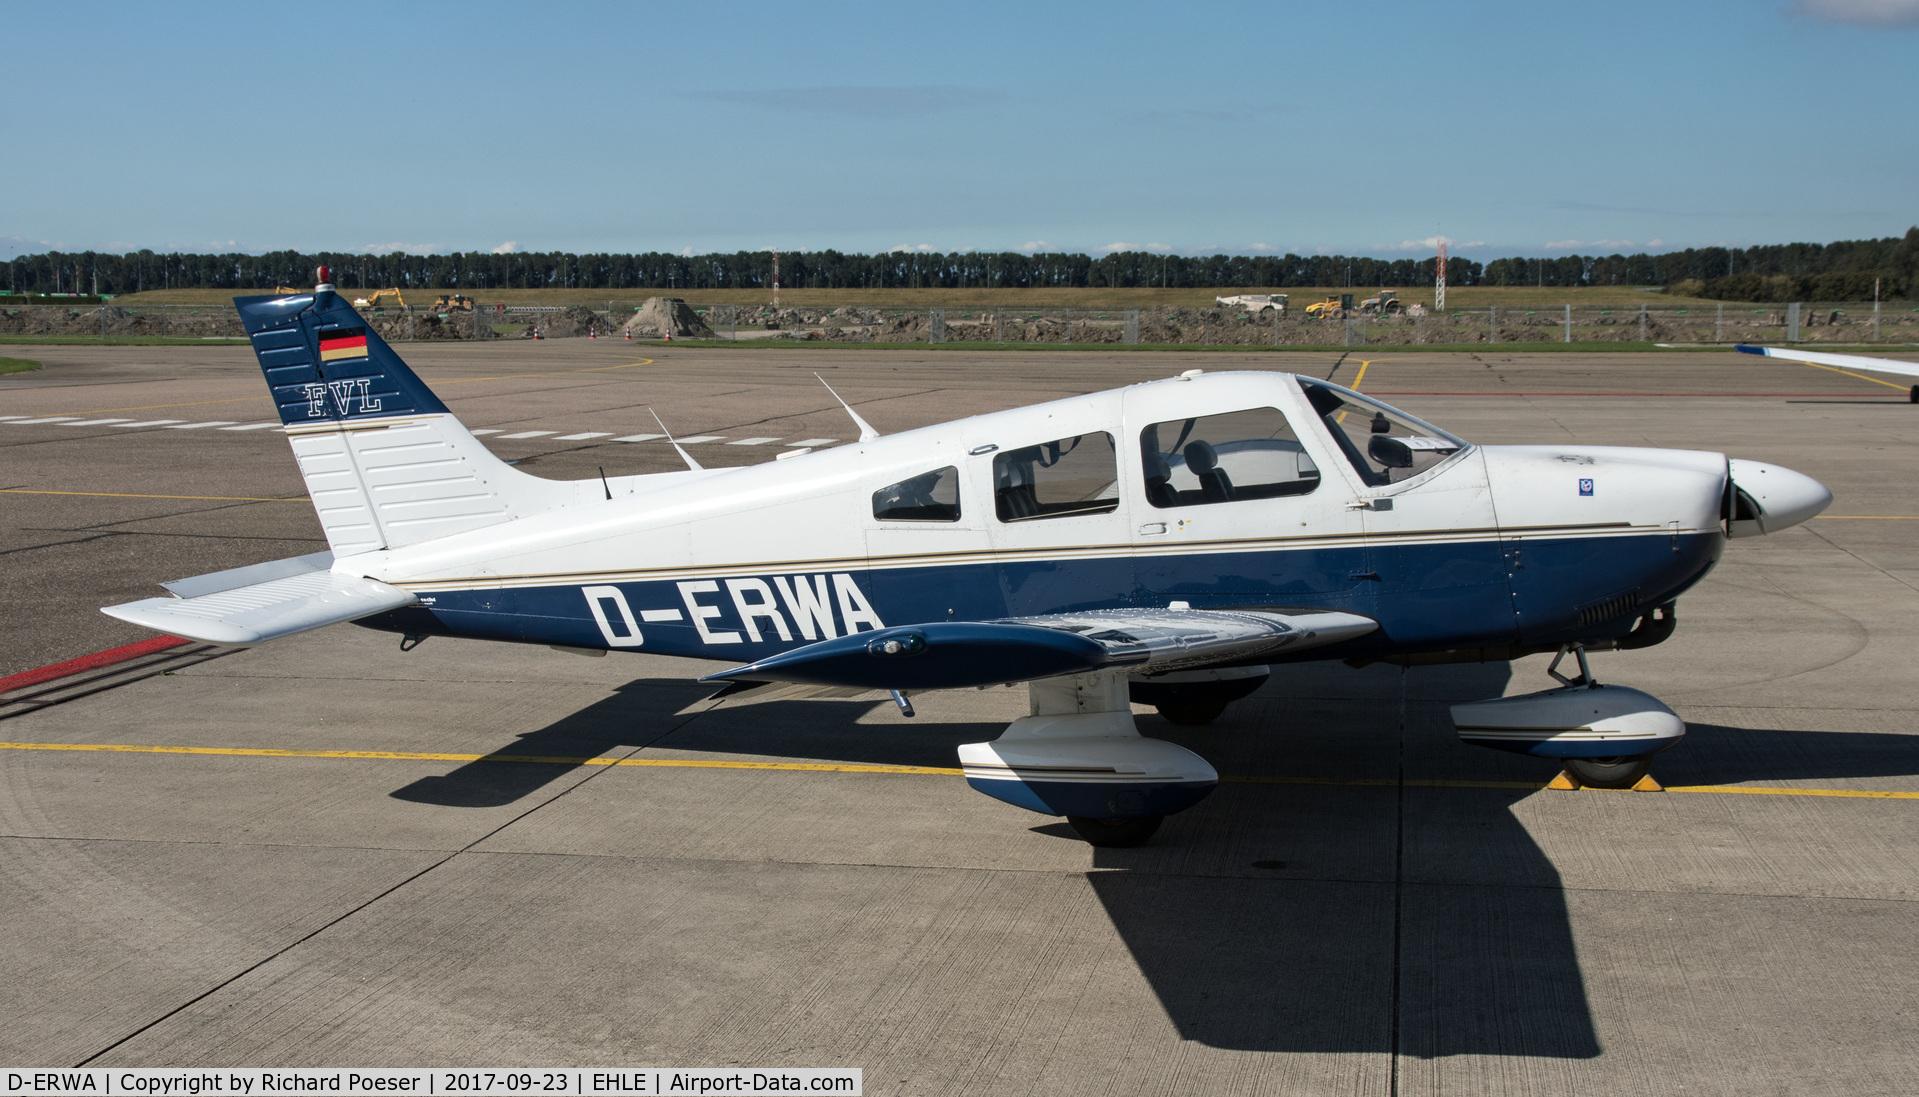 D-ERWA, Piper PA-28-181 Archer II C/N 28-8590078, Visiting Lelystad.